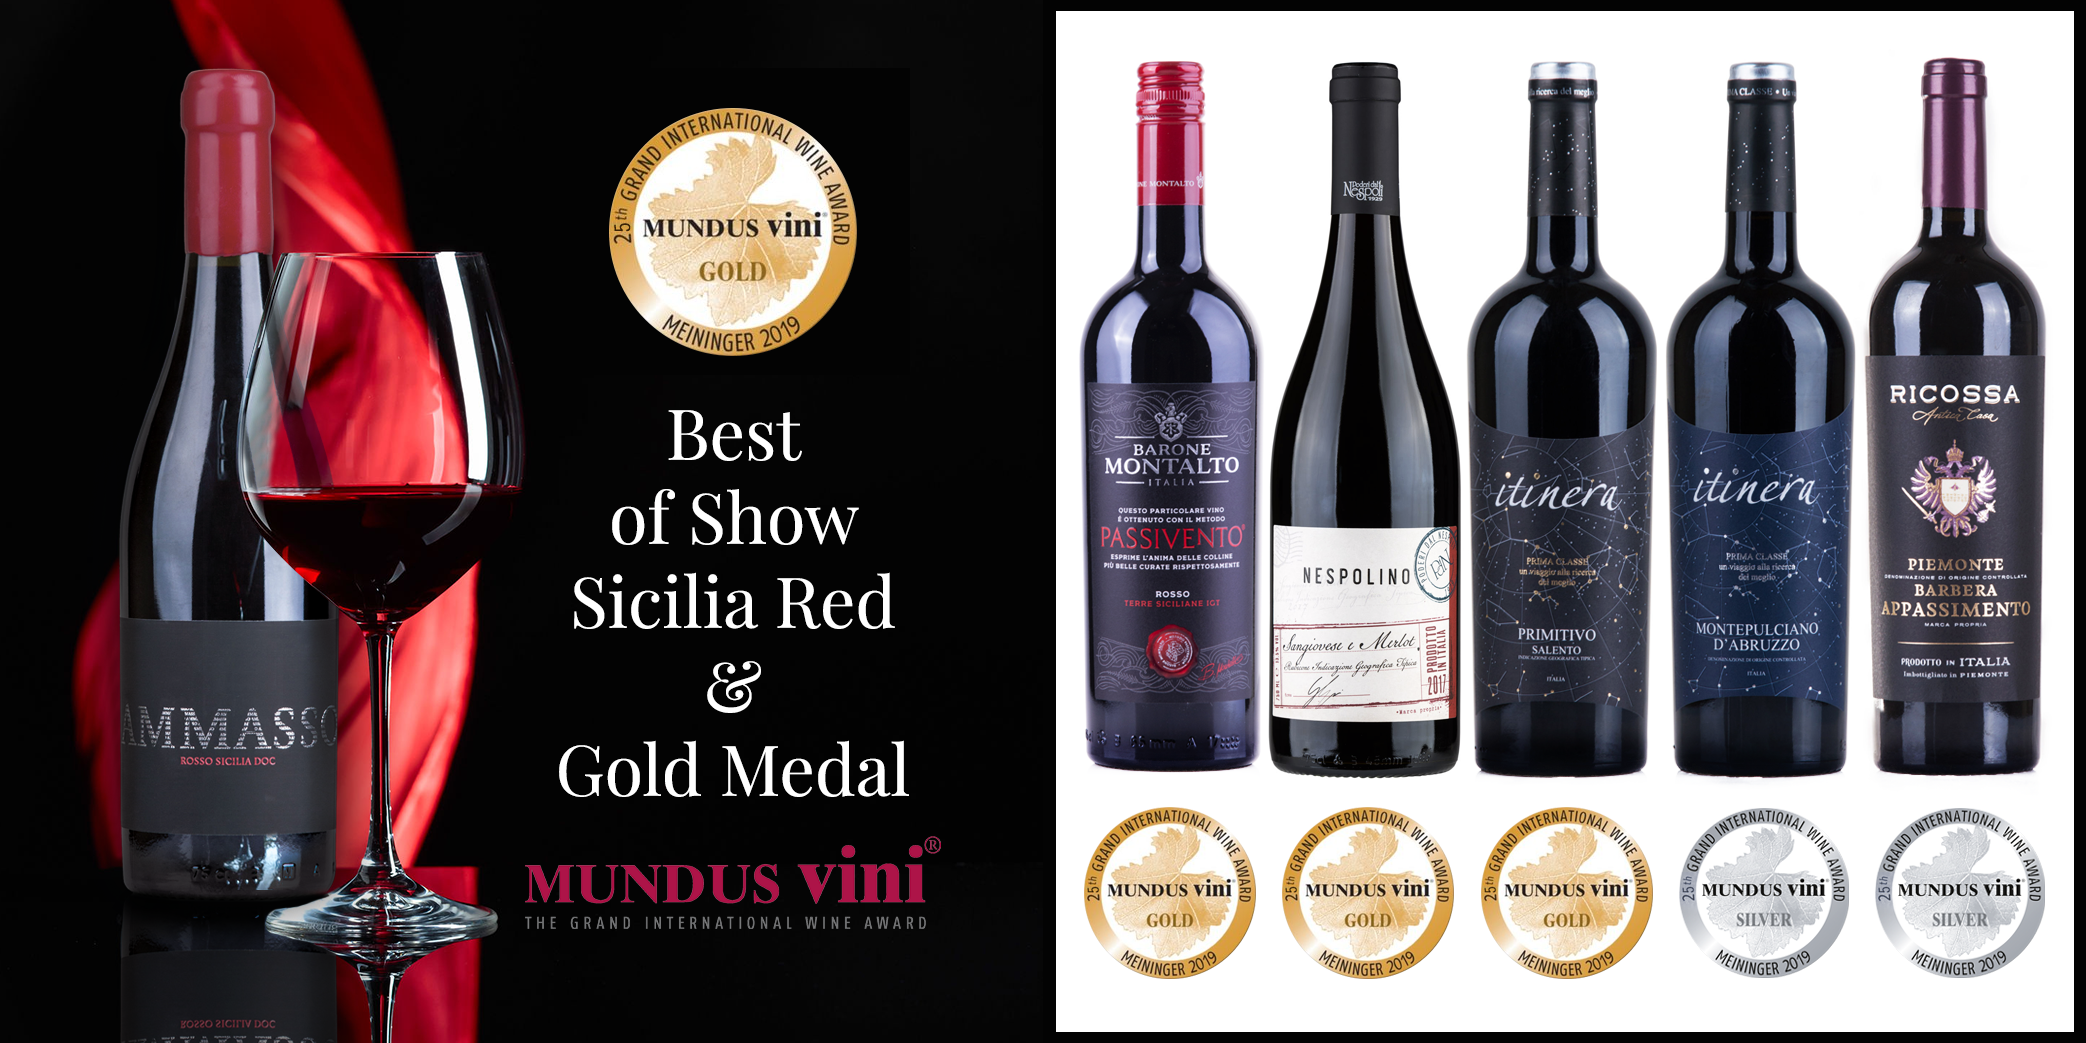 Mundus Vini Awards 2019